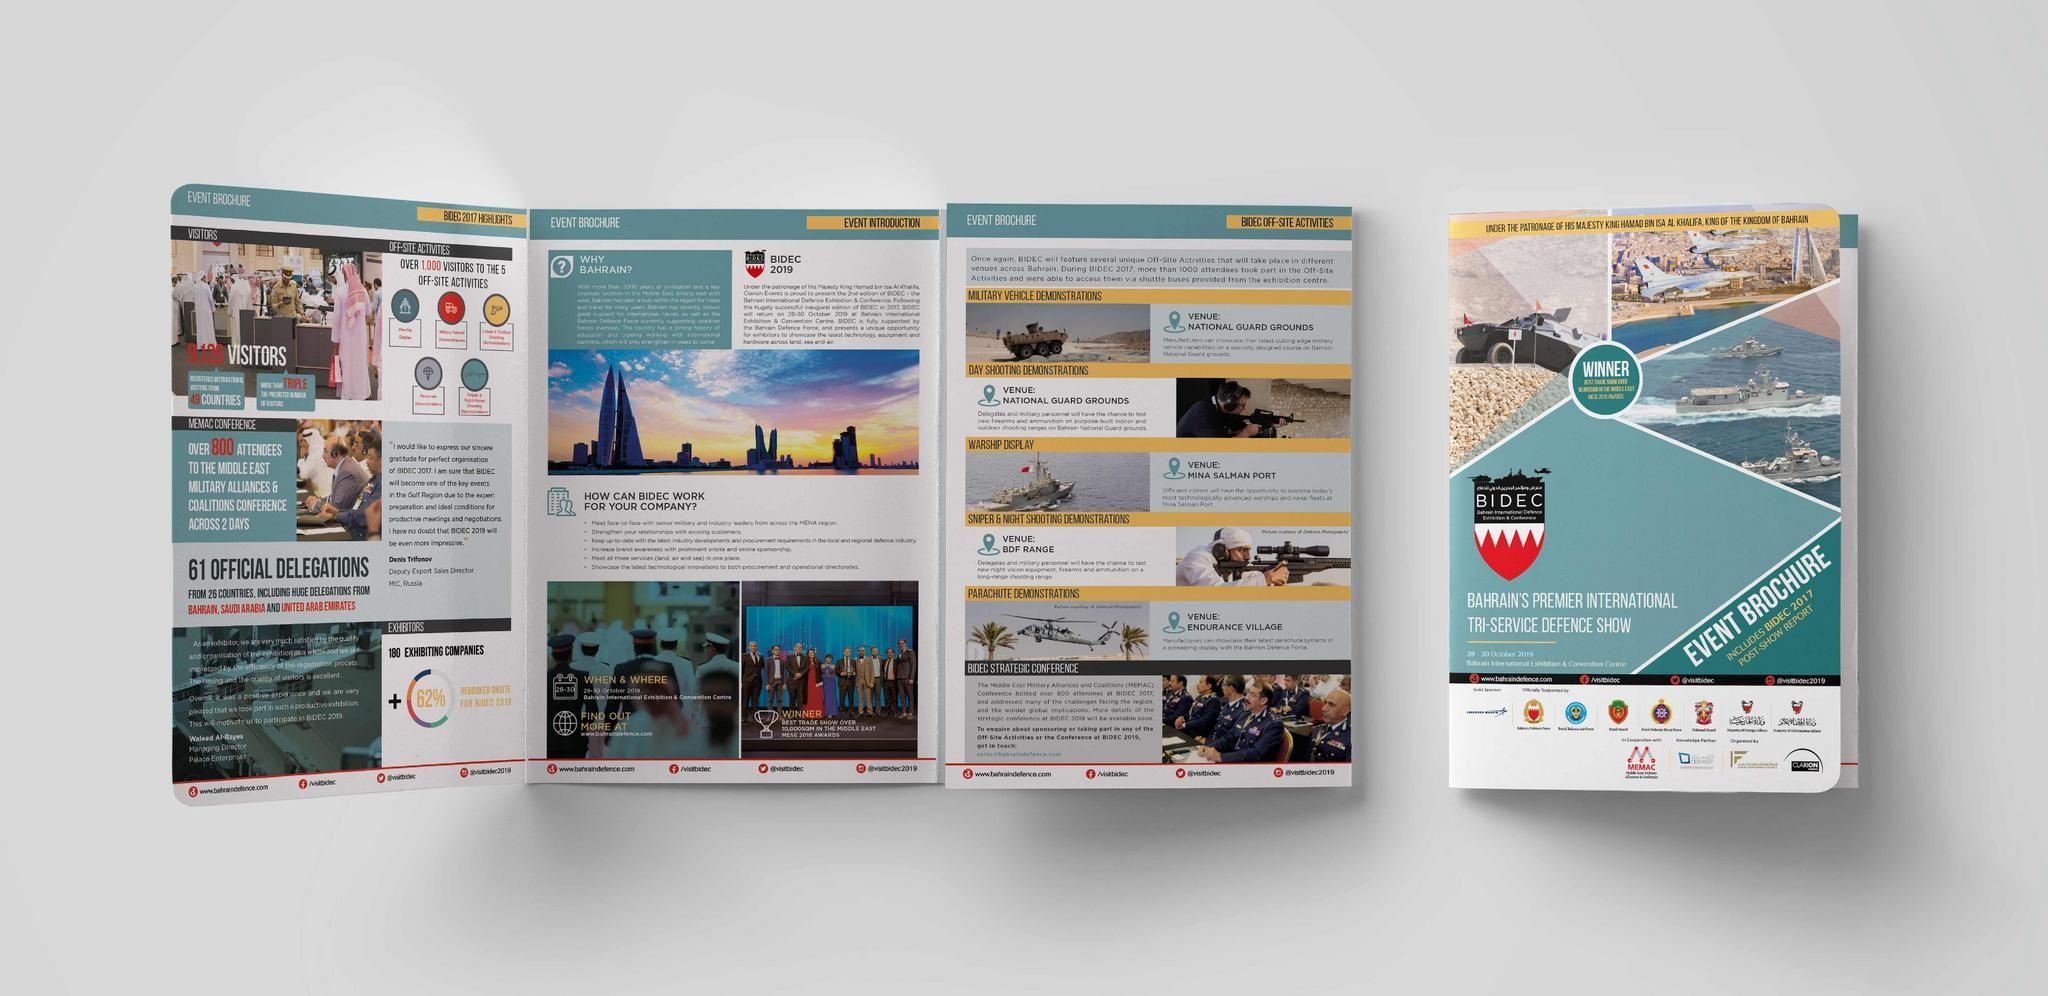 BIDEC brochure